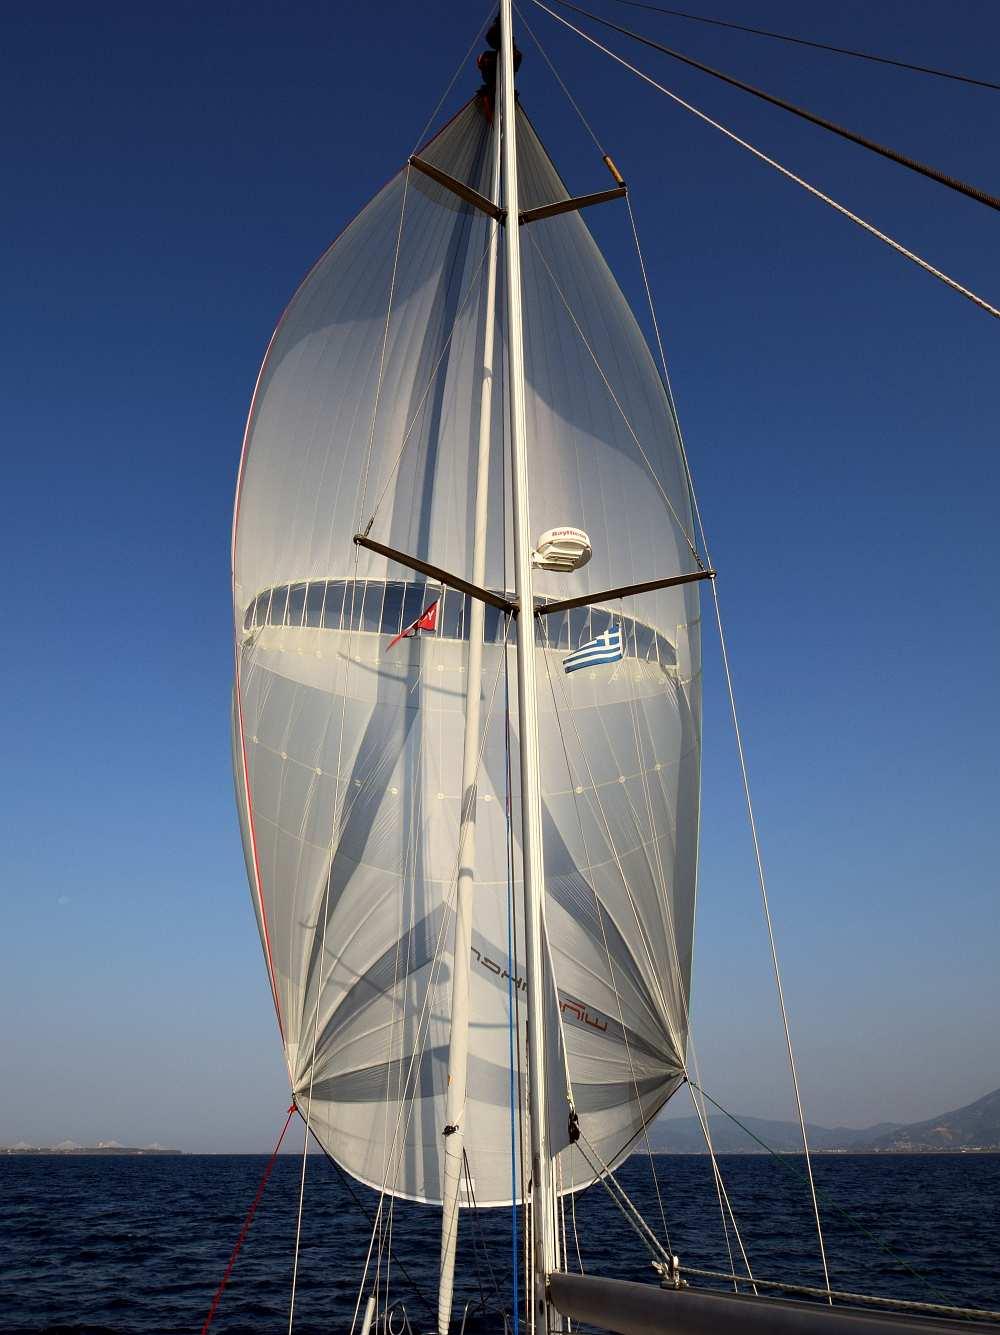 parasail-wingaker-segeln-golf-von-korinth